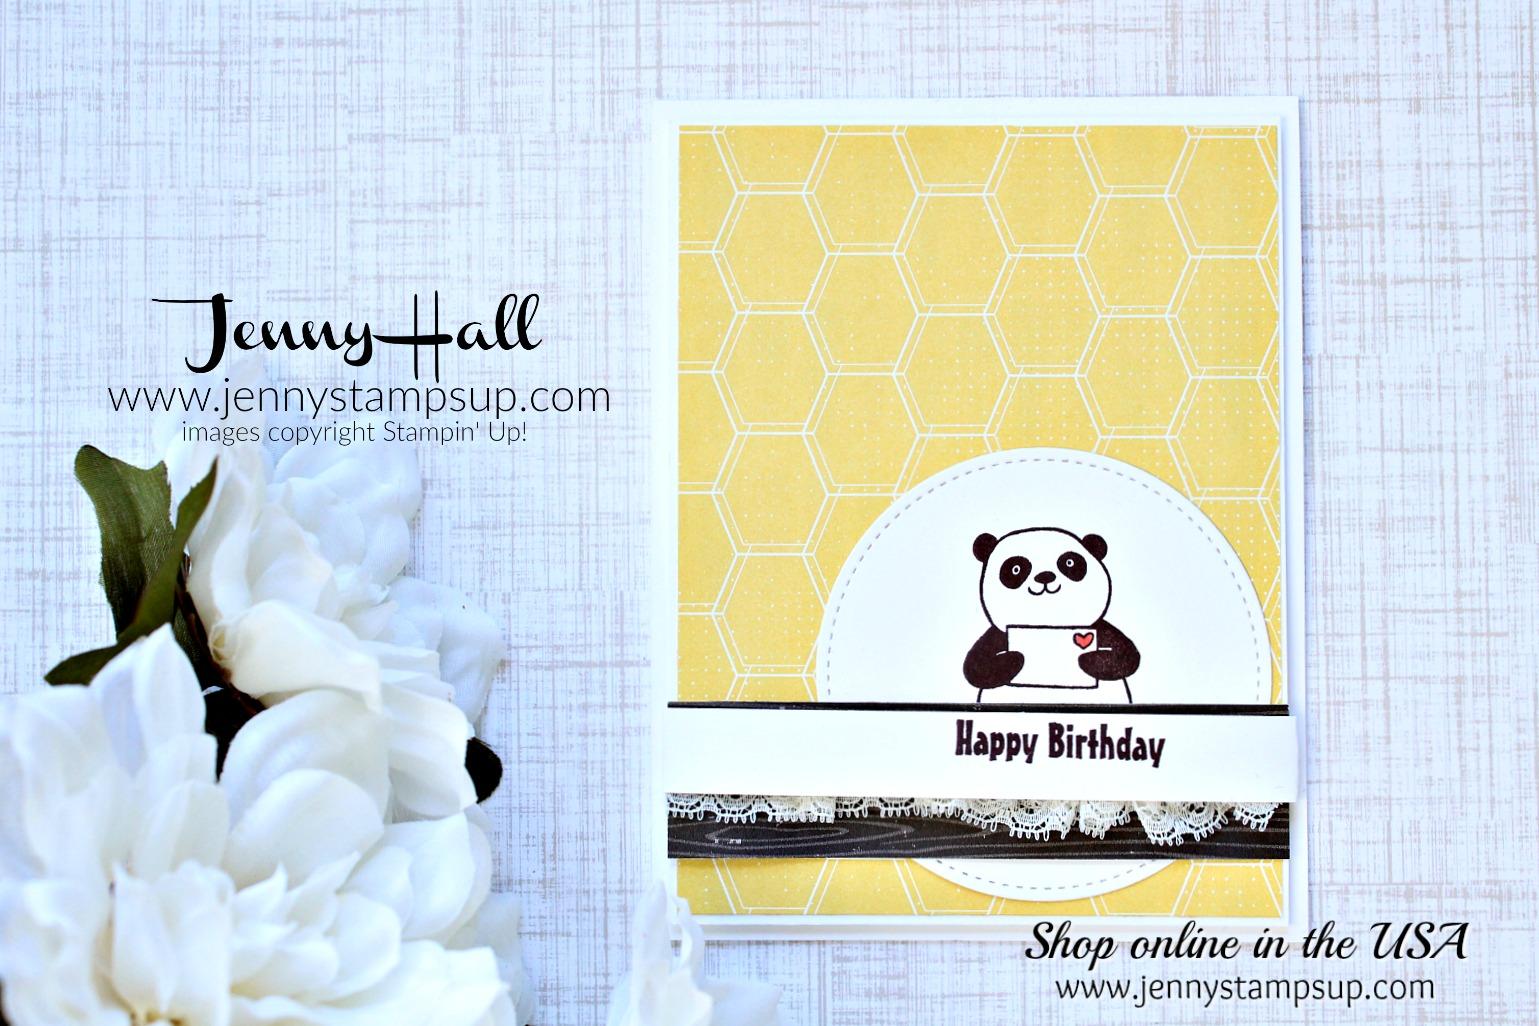 Party Pandas card by Jenny Hall at www.jennyhalldesign.com for #cardmaking #cardmaker #kidfriendlycraft #stitchedshapesframelits #honeybear #bubblesandfizzdsp #wwys #whatwillyoustamp #stampinup #cardmakingvideo #jennyhalldesign #jennystampsup #jennyhallstampinup #papercraft #artsandcrafts #diy